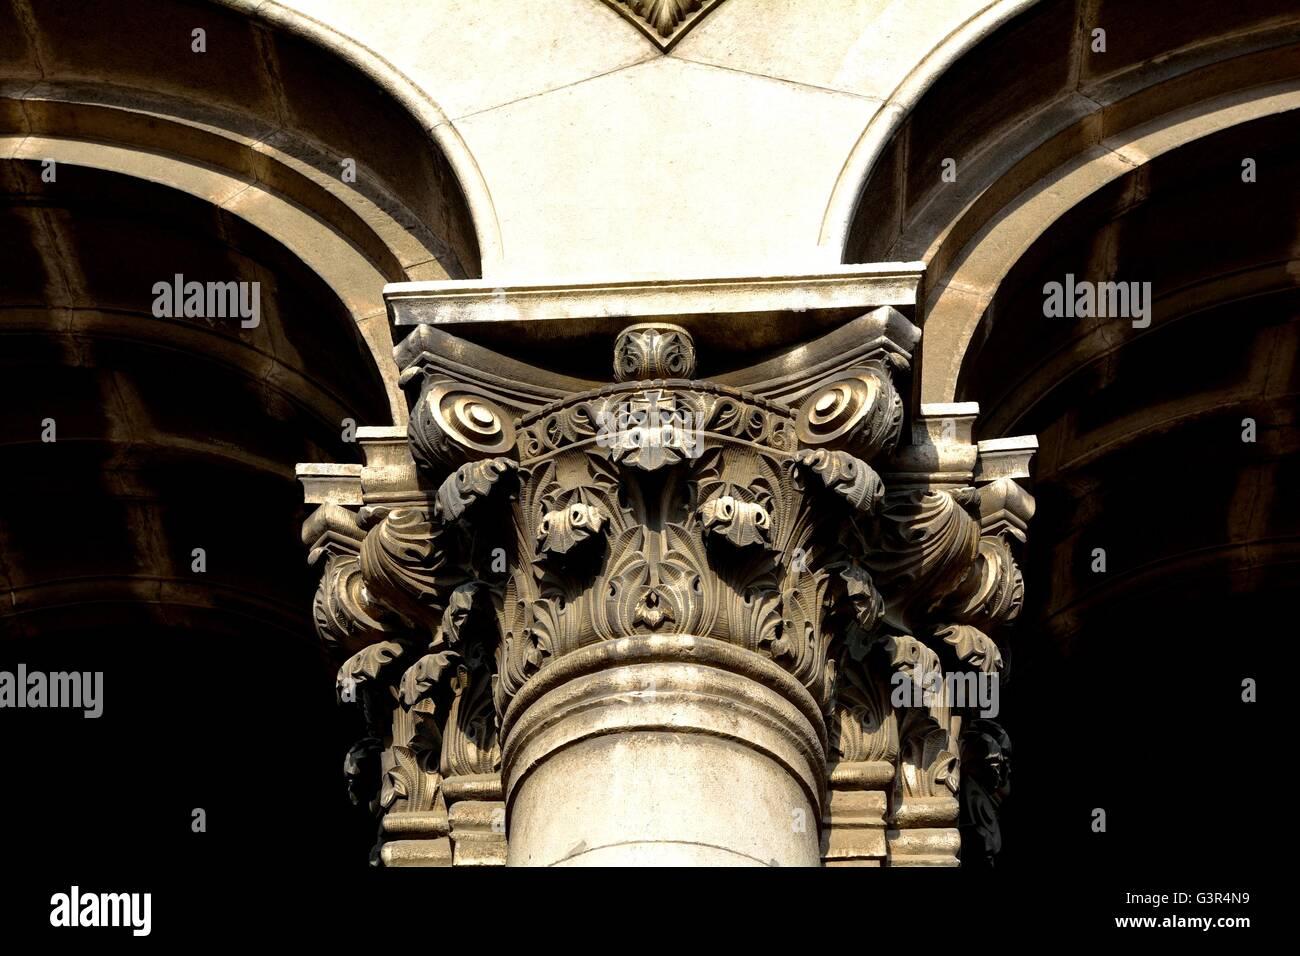 Capitel and archs - Stock Image